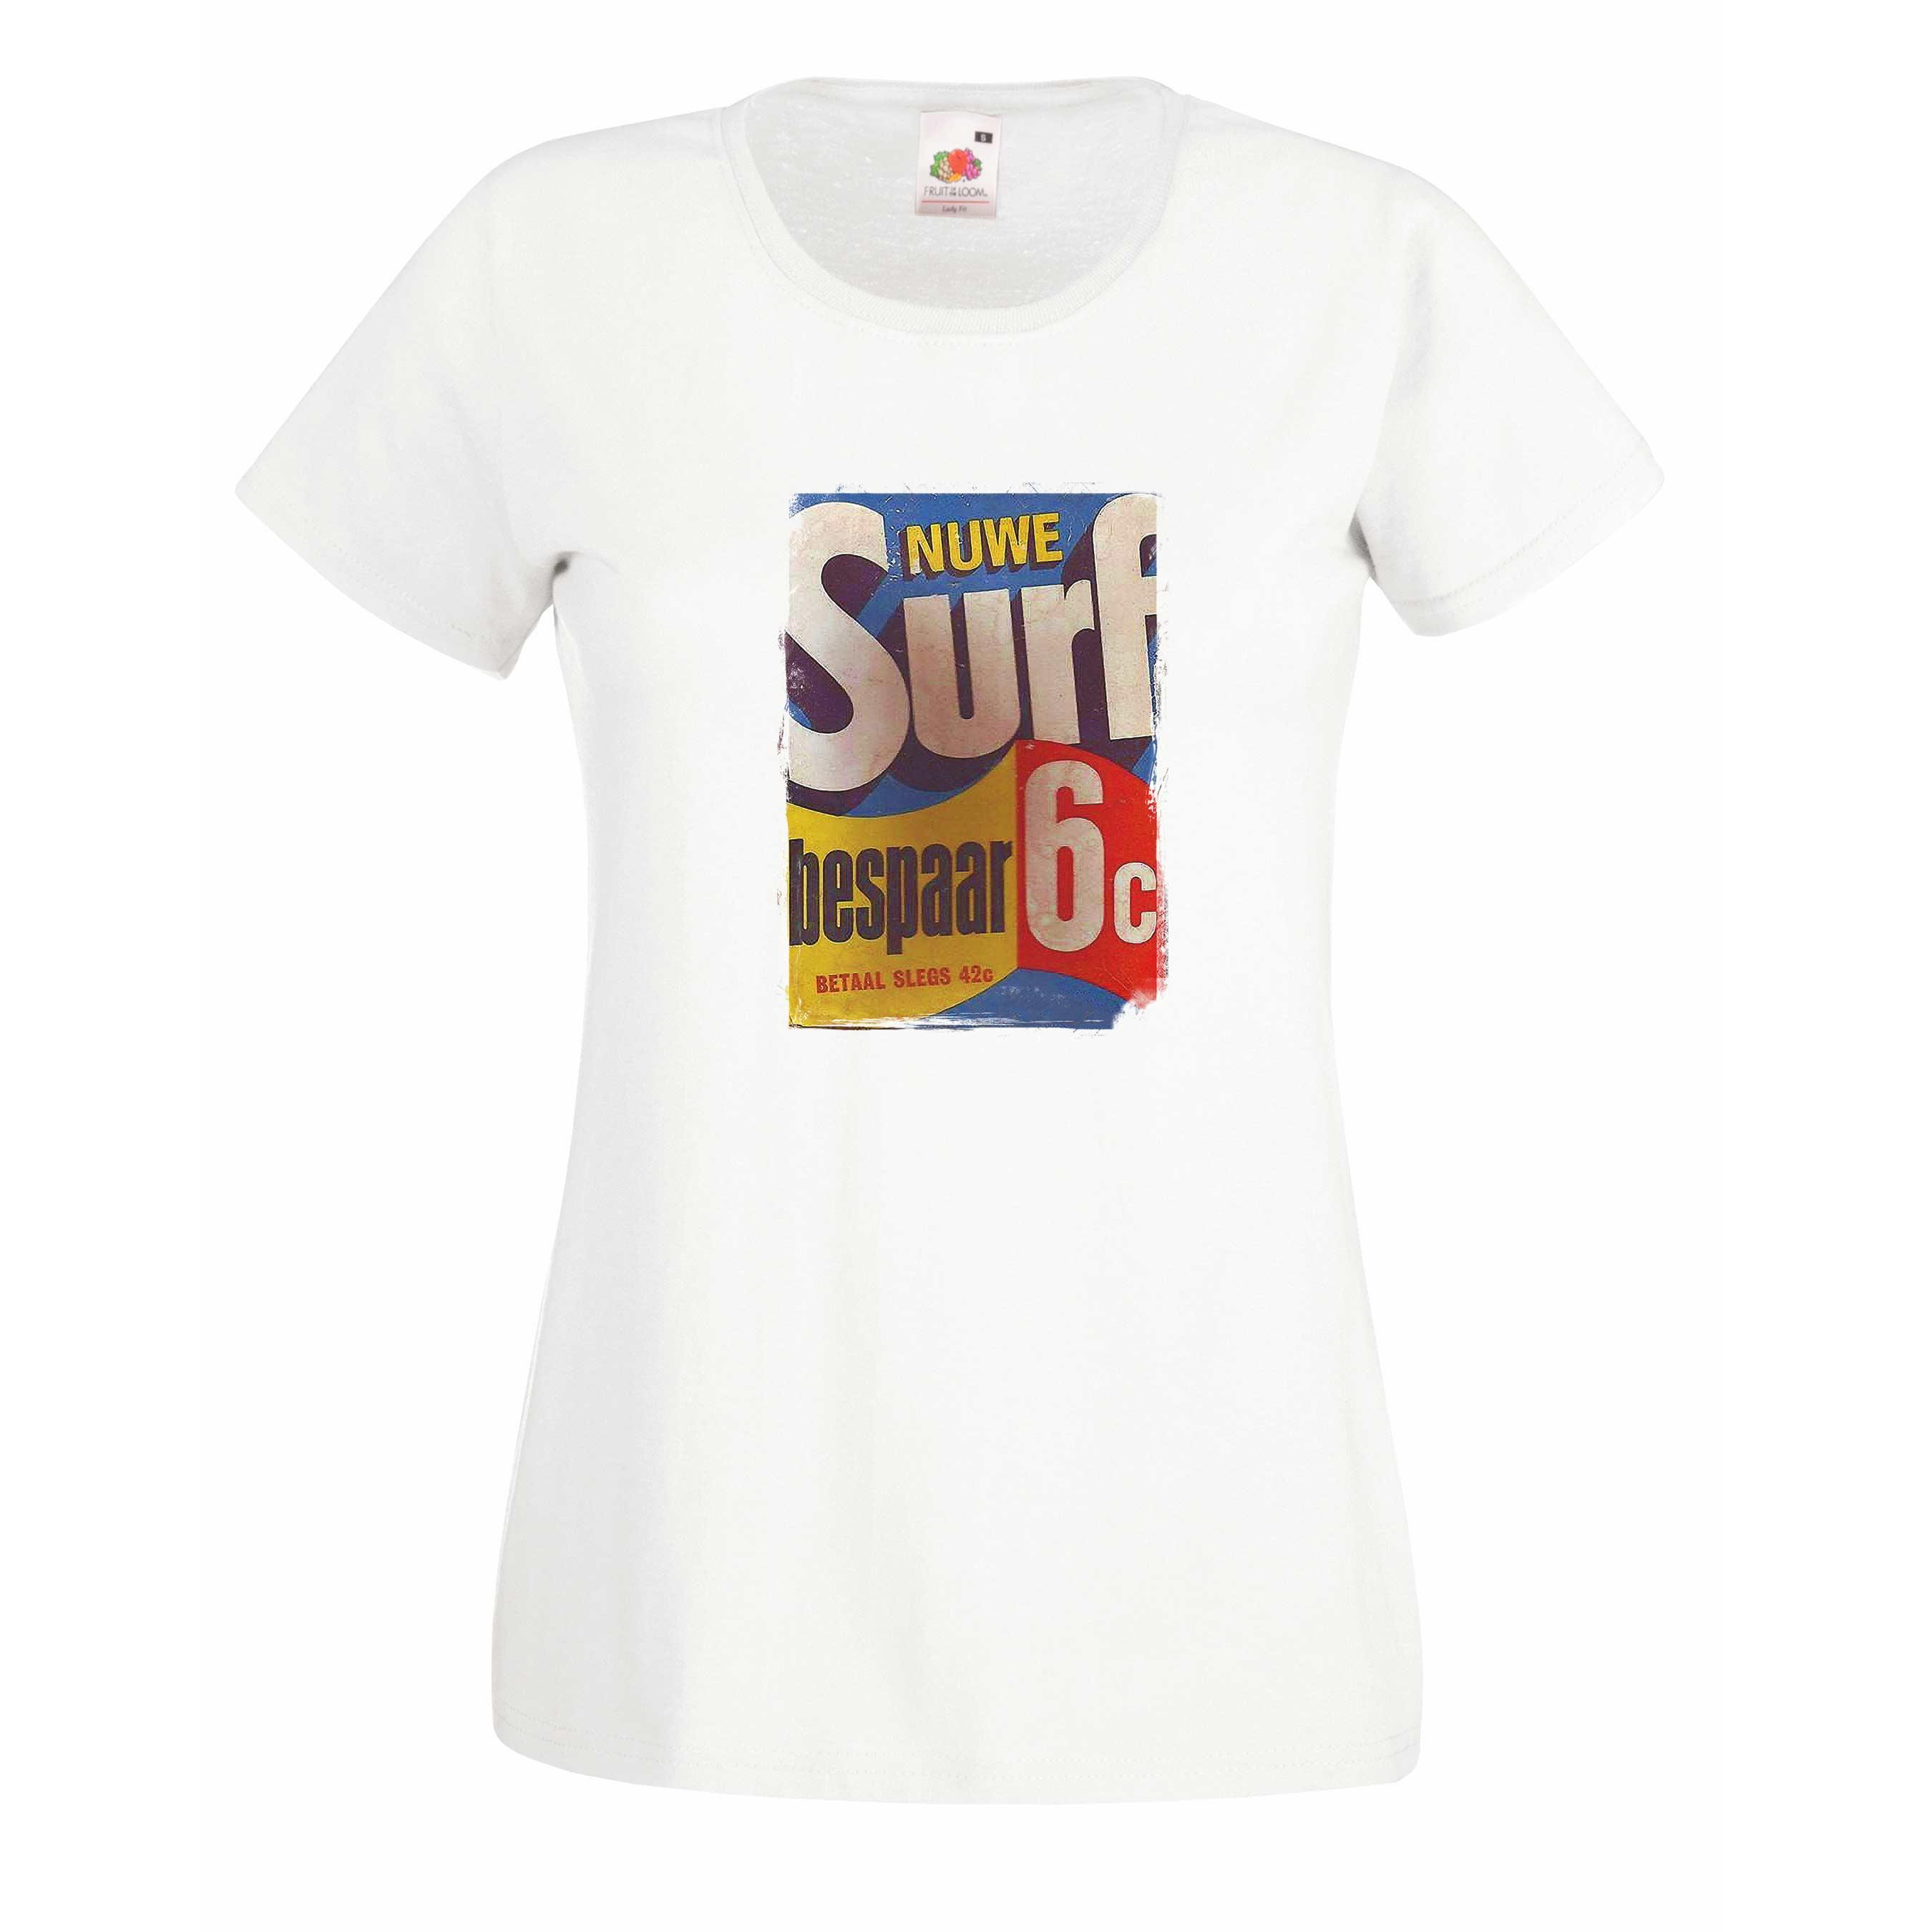 Surf design for t-shirt, hoodie & sweatshirt